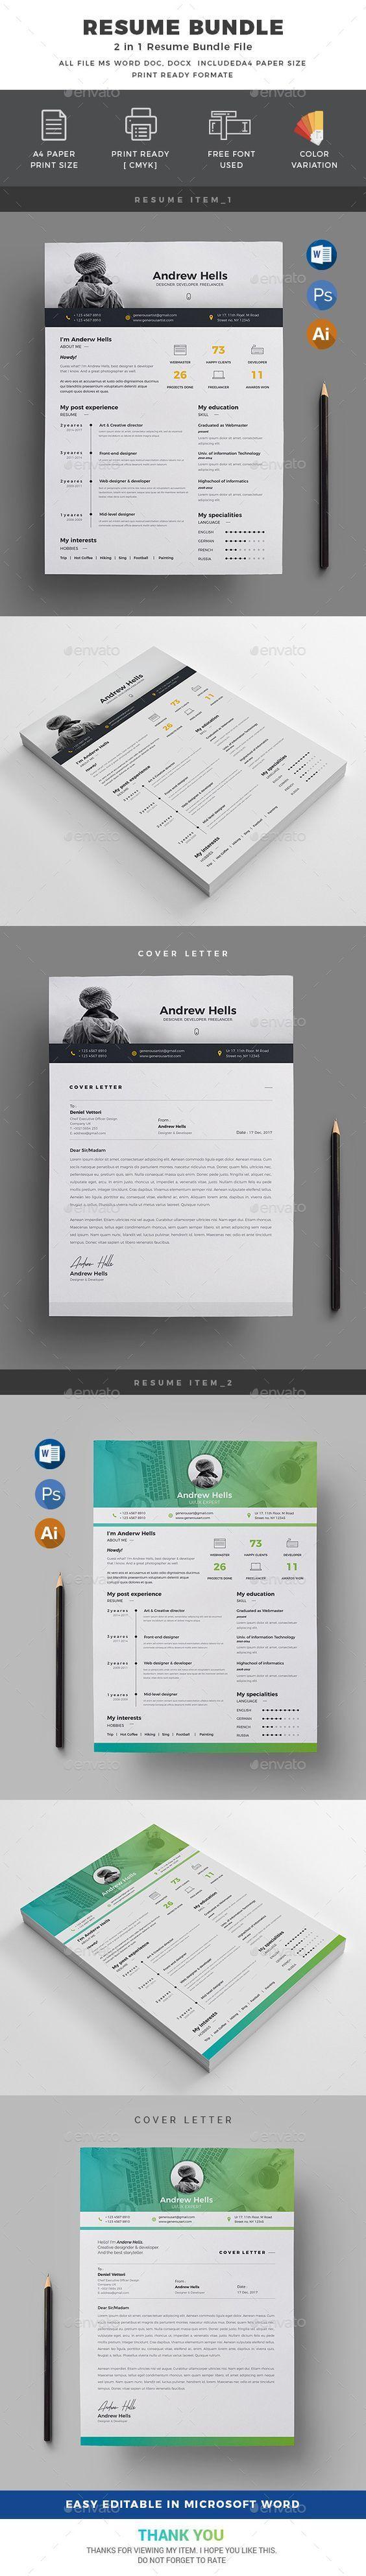 Resume Bundle2 in 1 Resumes Stationery